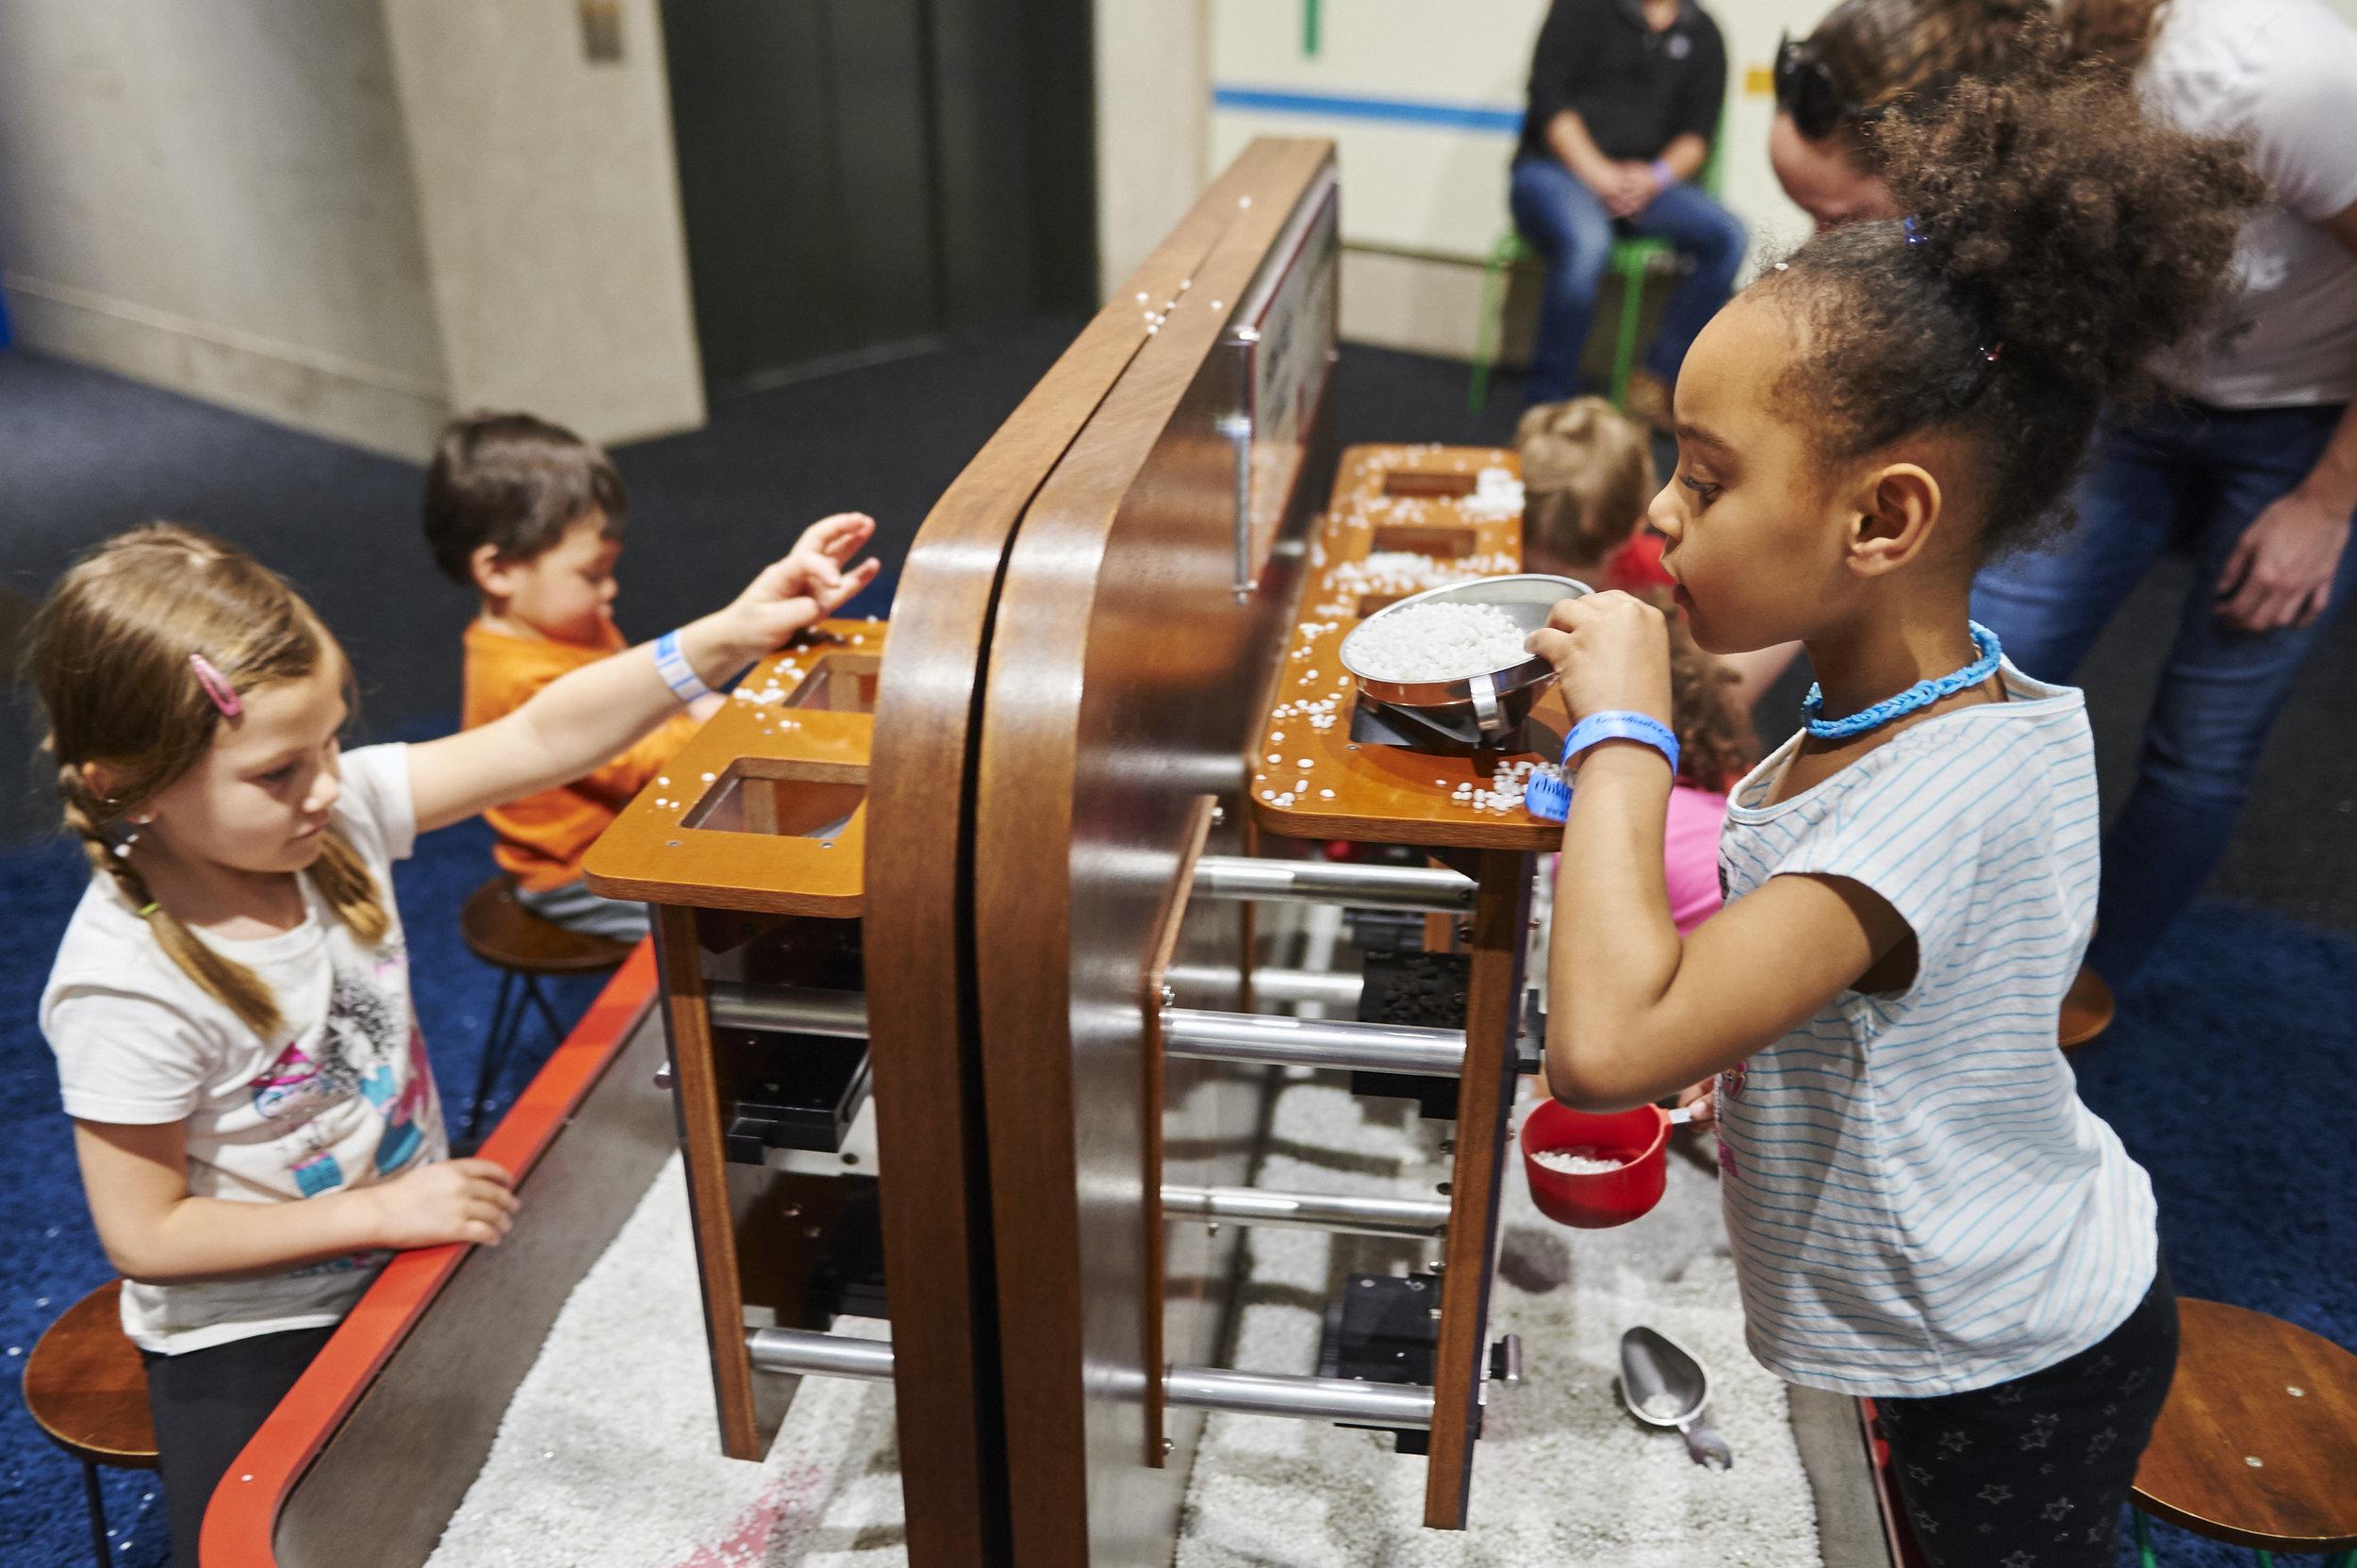 170417_ChildrensMuseum_Measure_168.jpg